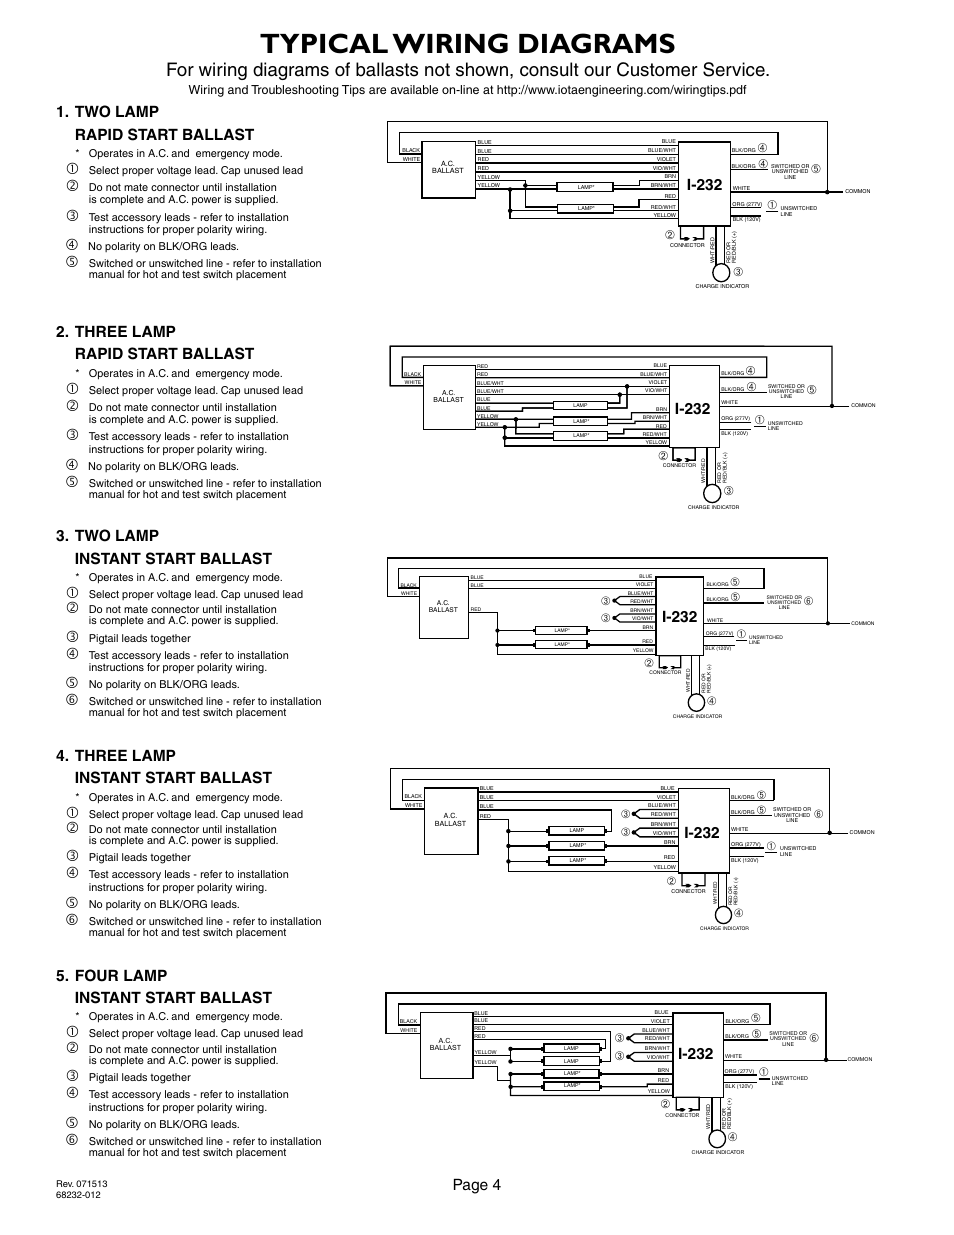 iota i 232 page4?resize\=840%2C1087 iota i42 wiring diagrams wiring diagrams iota isd-80 wiring diagram at nearapp.co